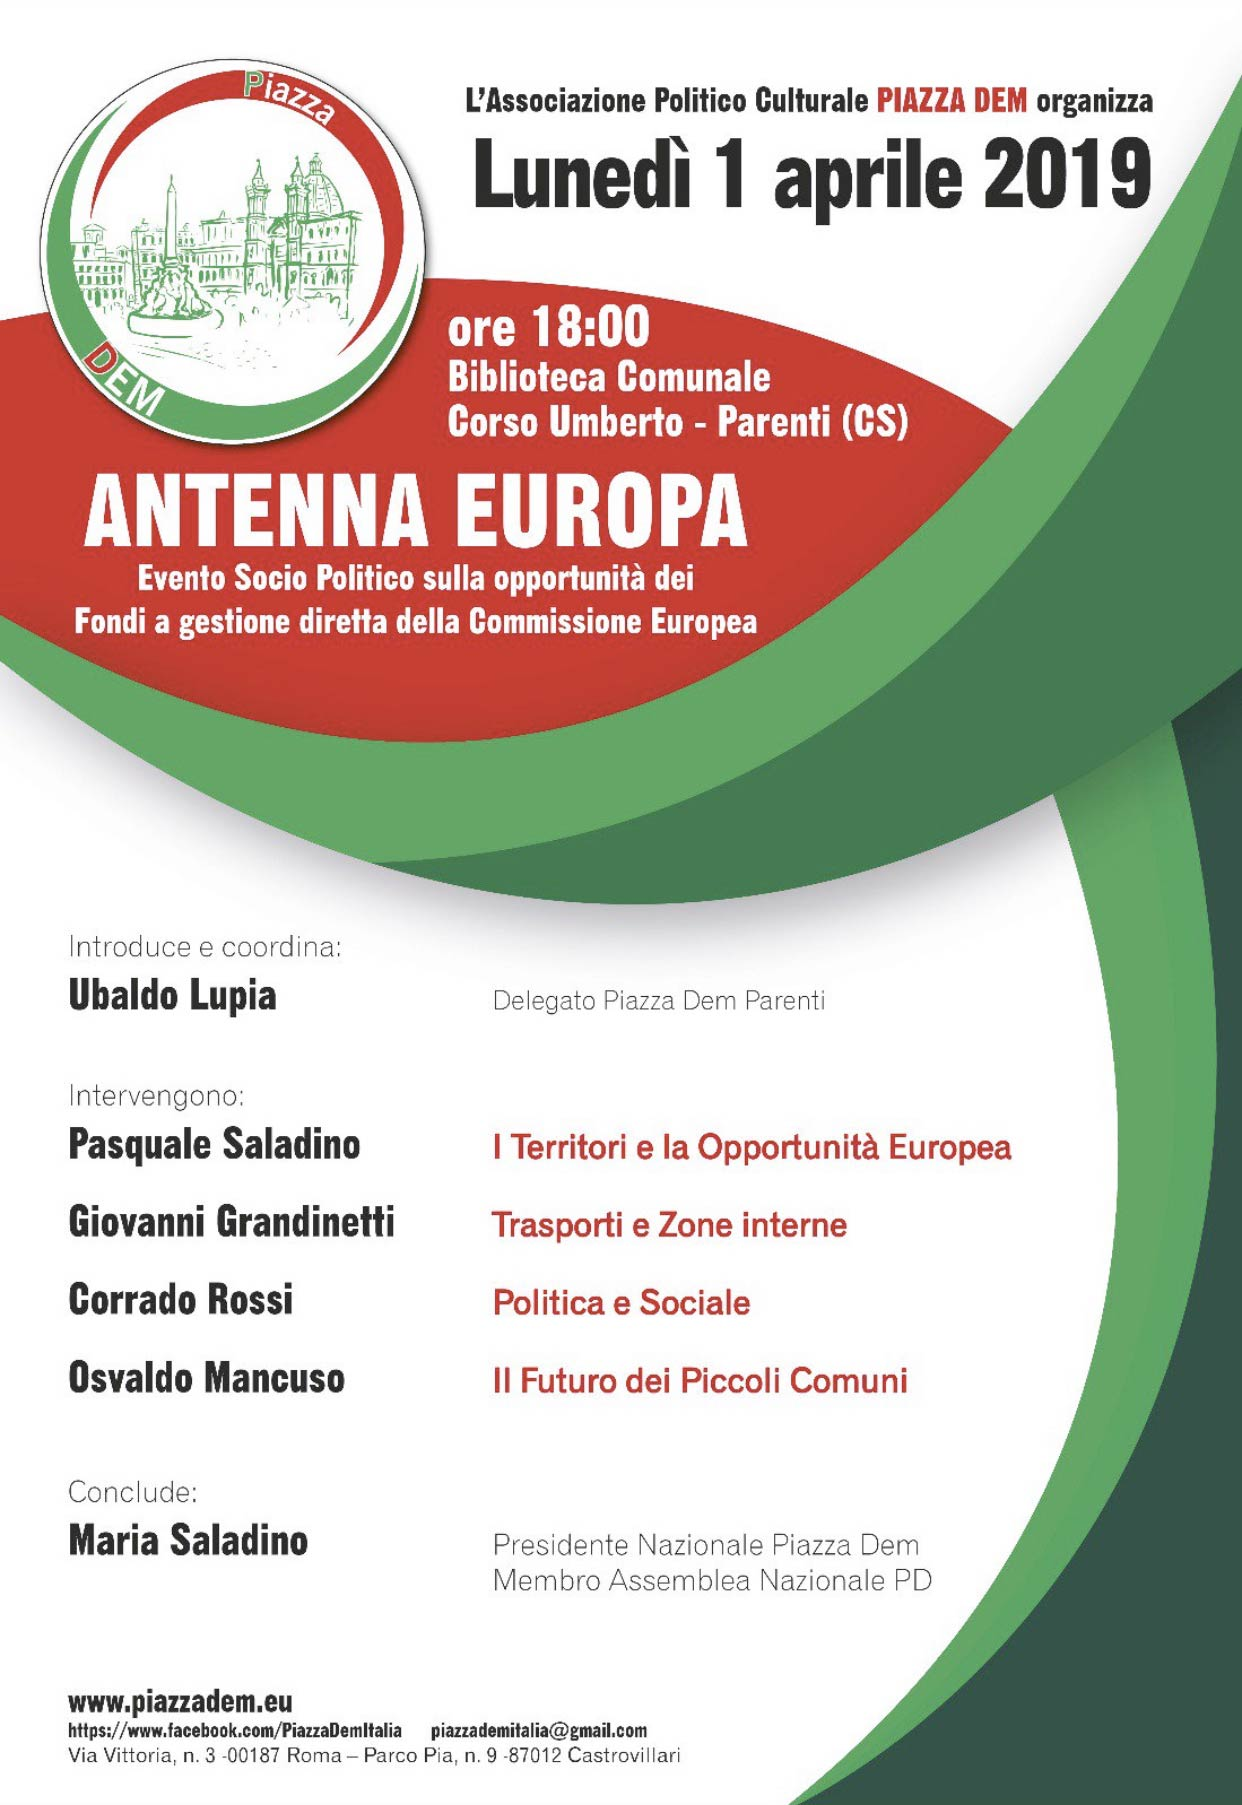 Antenna Europa